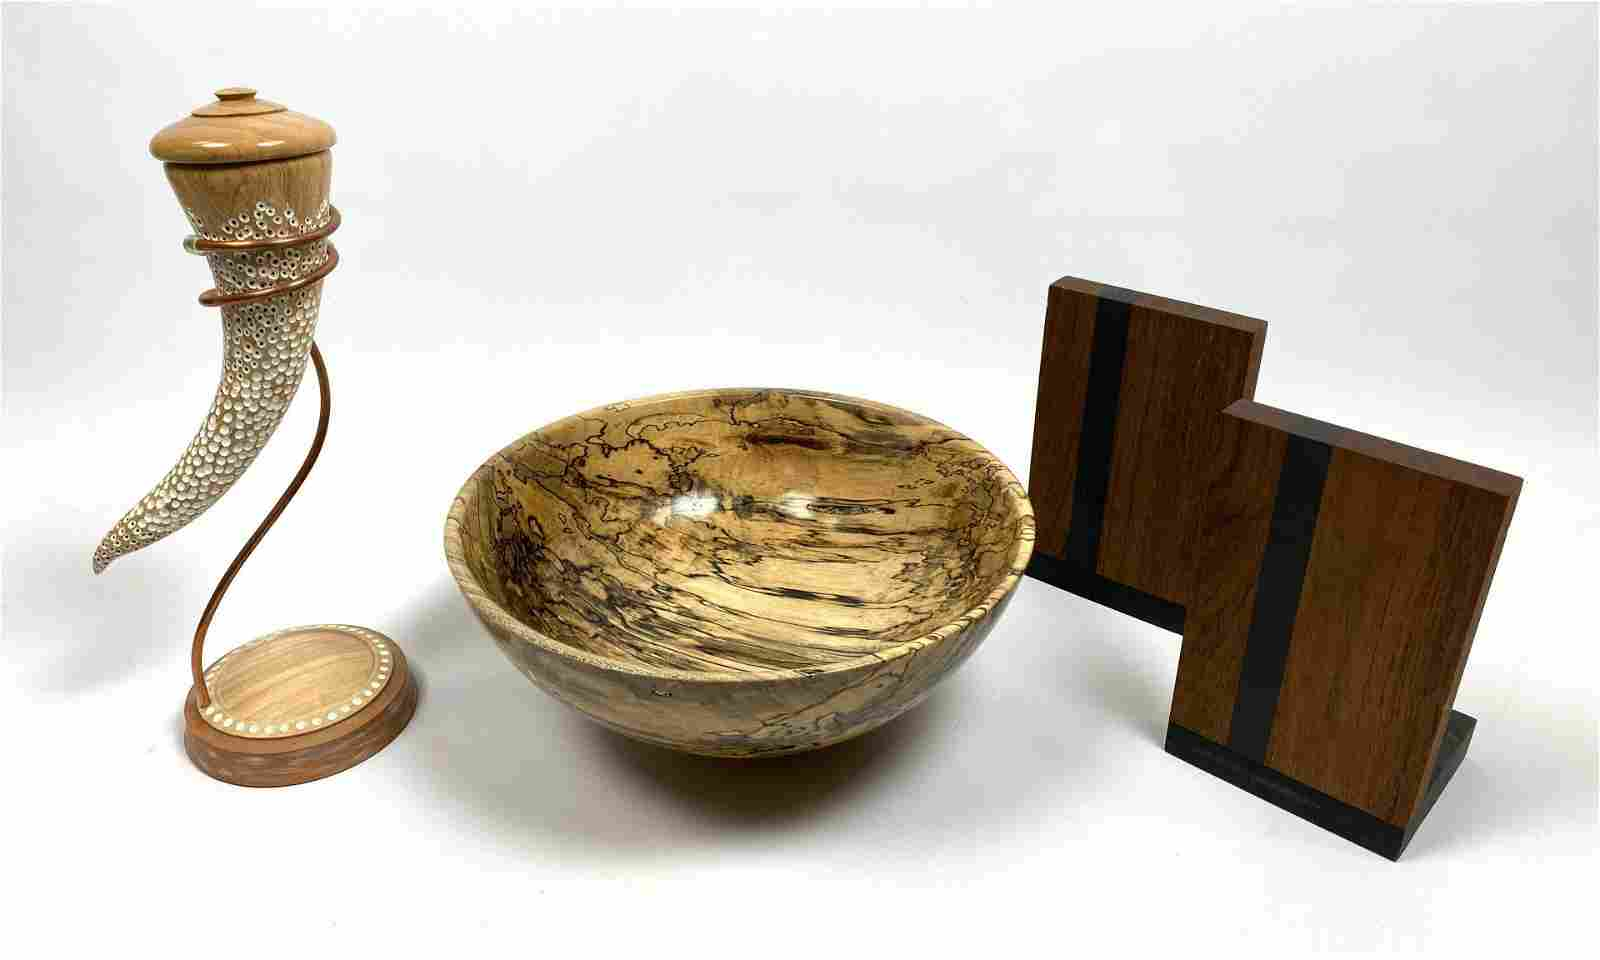 3pc Modernist Wood Objects. 1) PAUL EVANS & PHILIP POWE